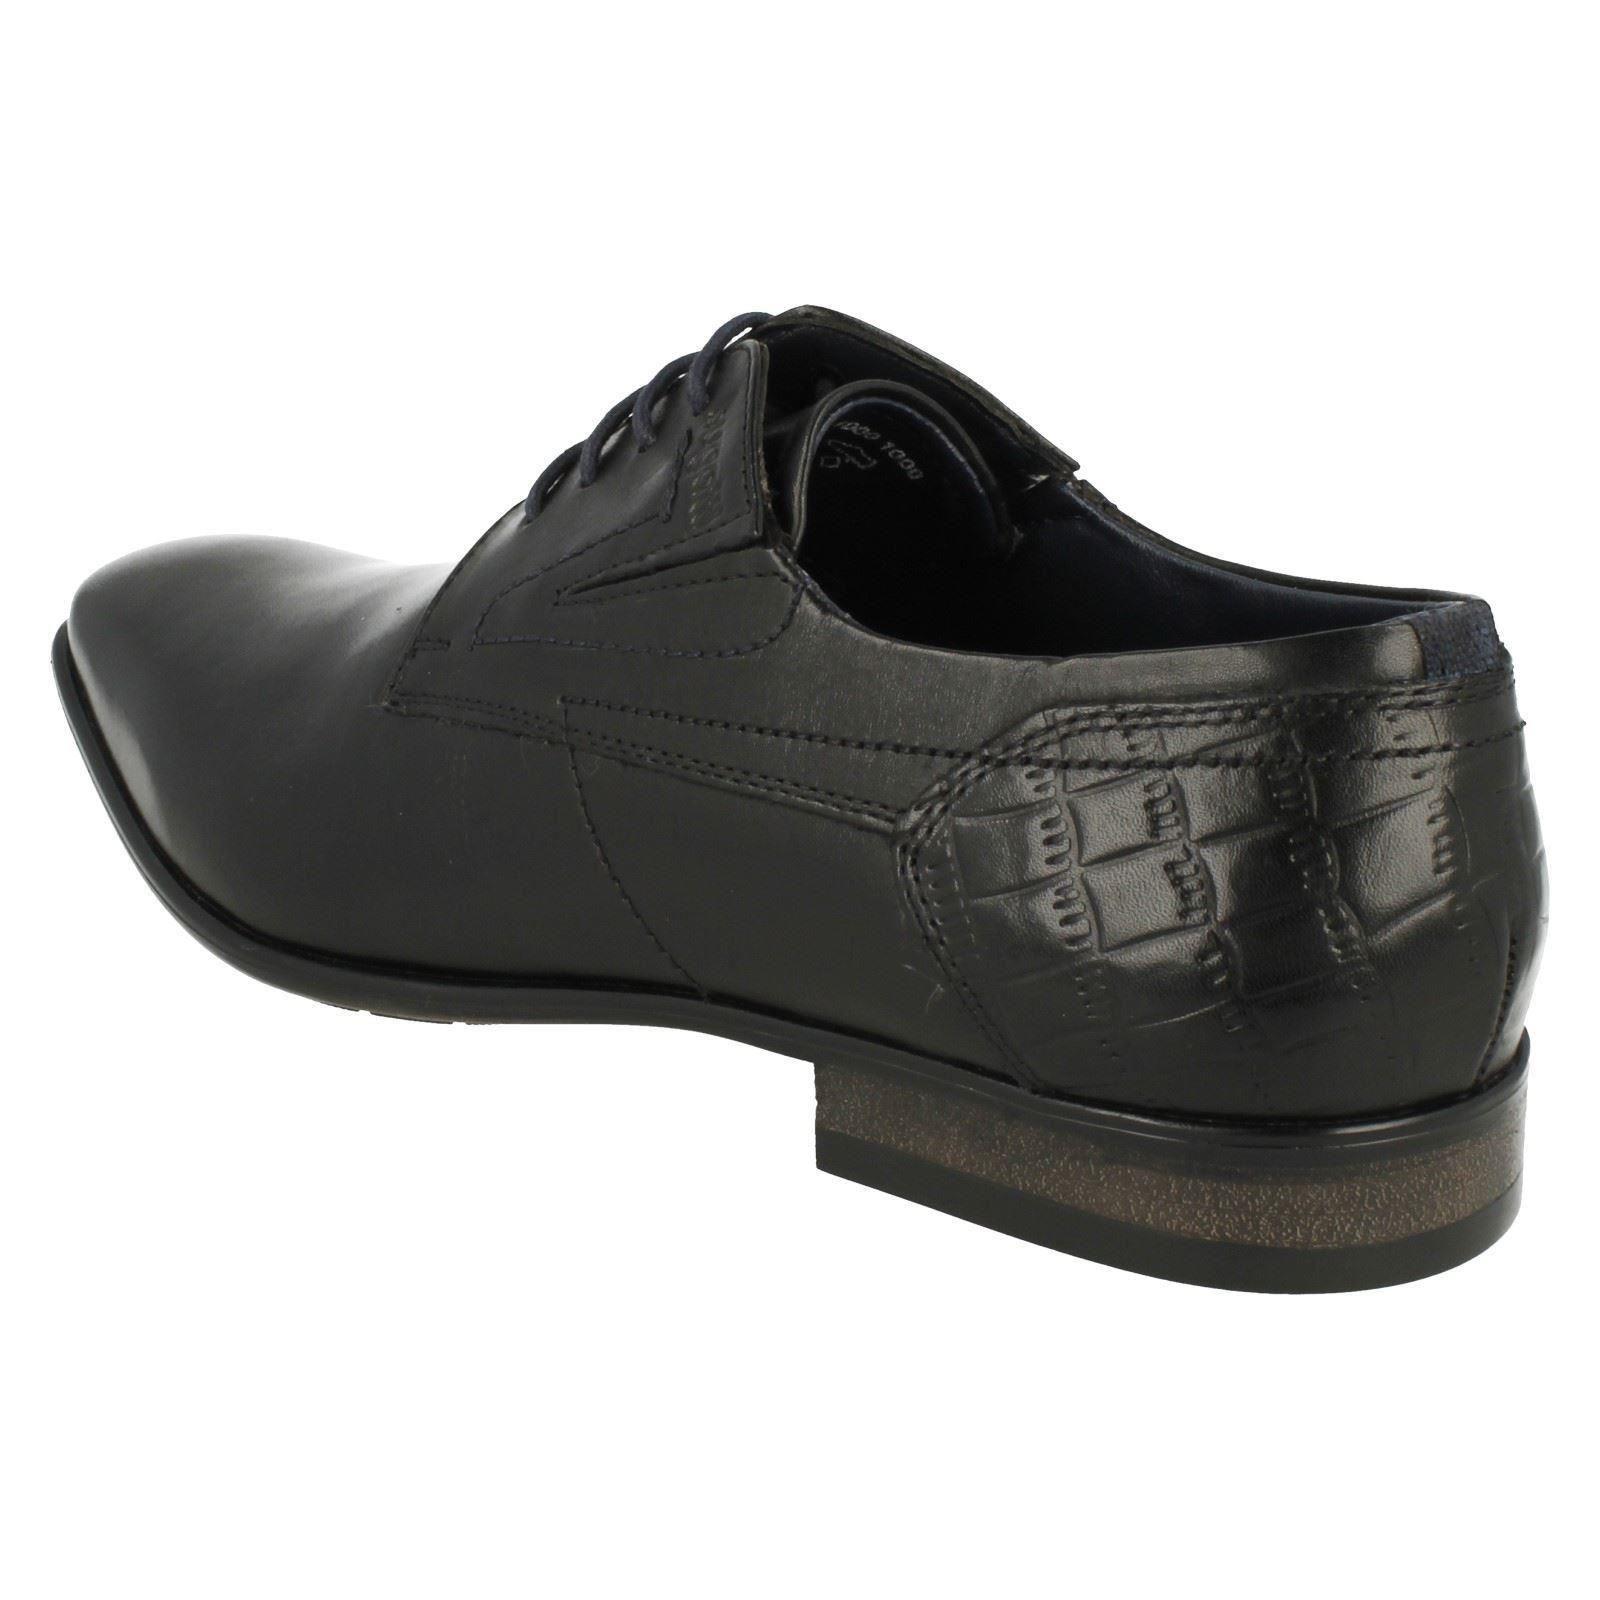 Mens Bugatti Formal Shoes 311-18801   eBay